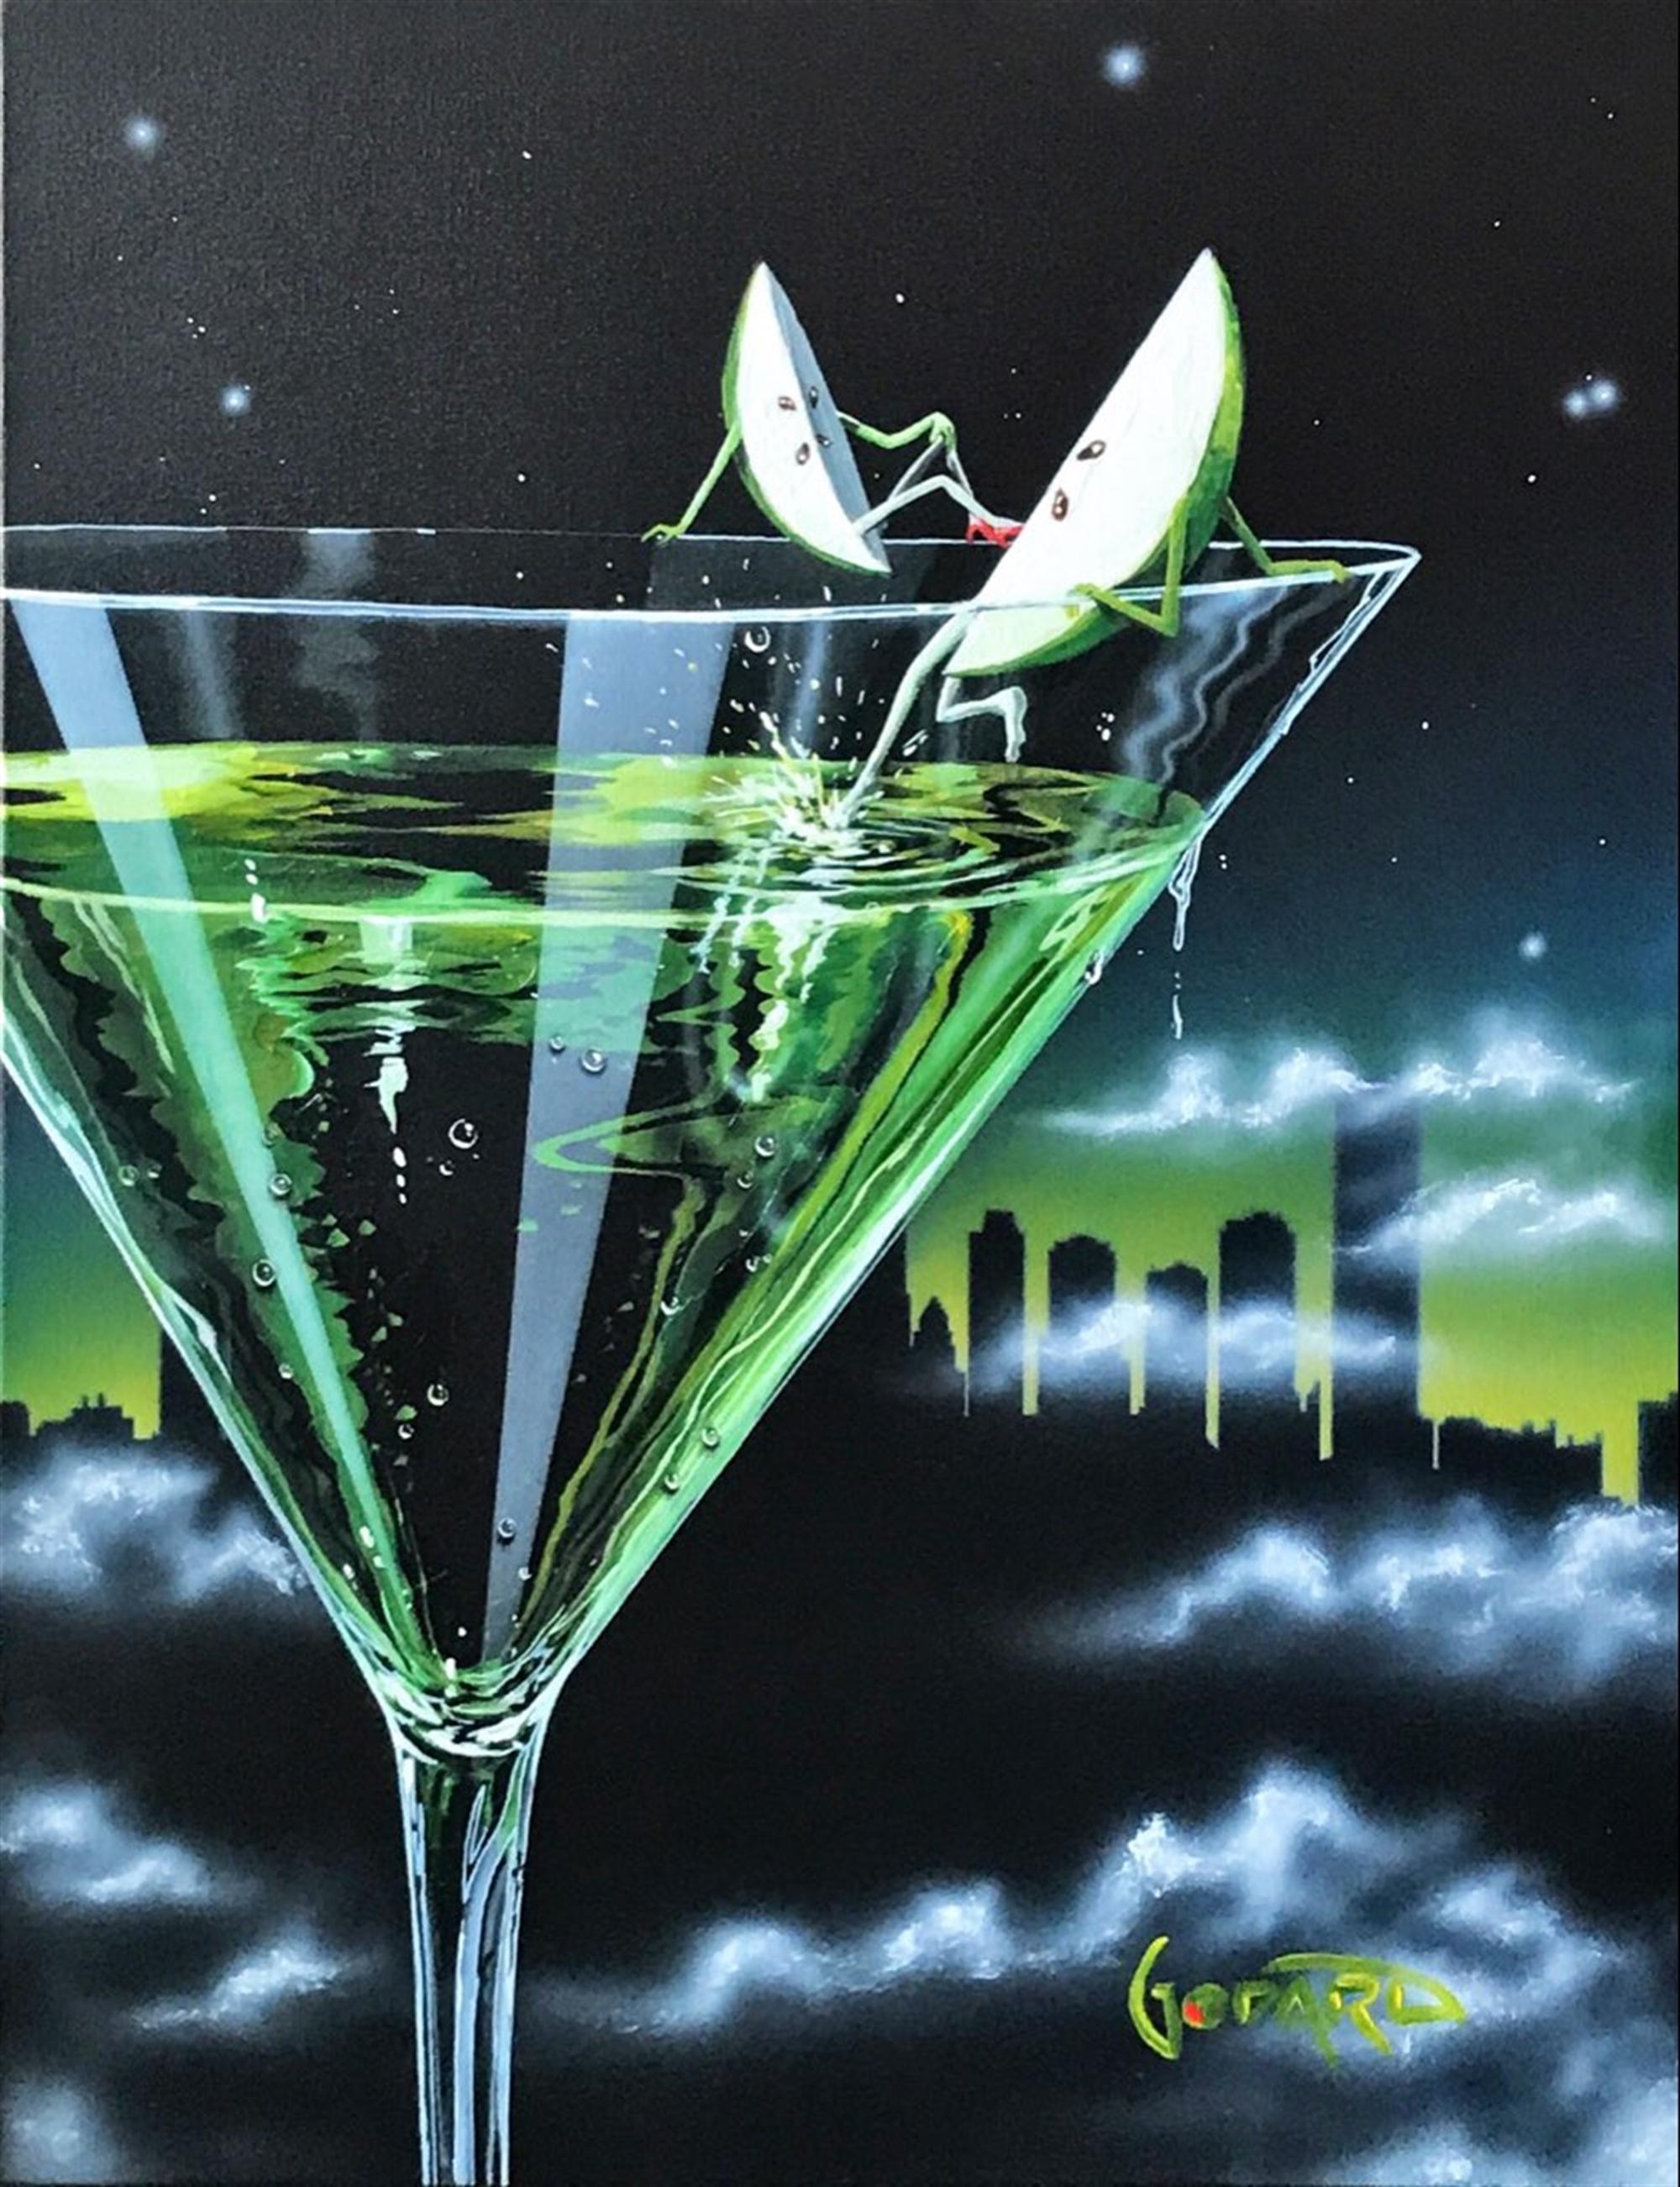 What a Night by Michael Godard